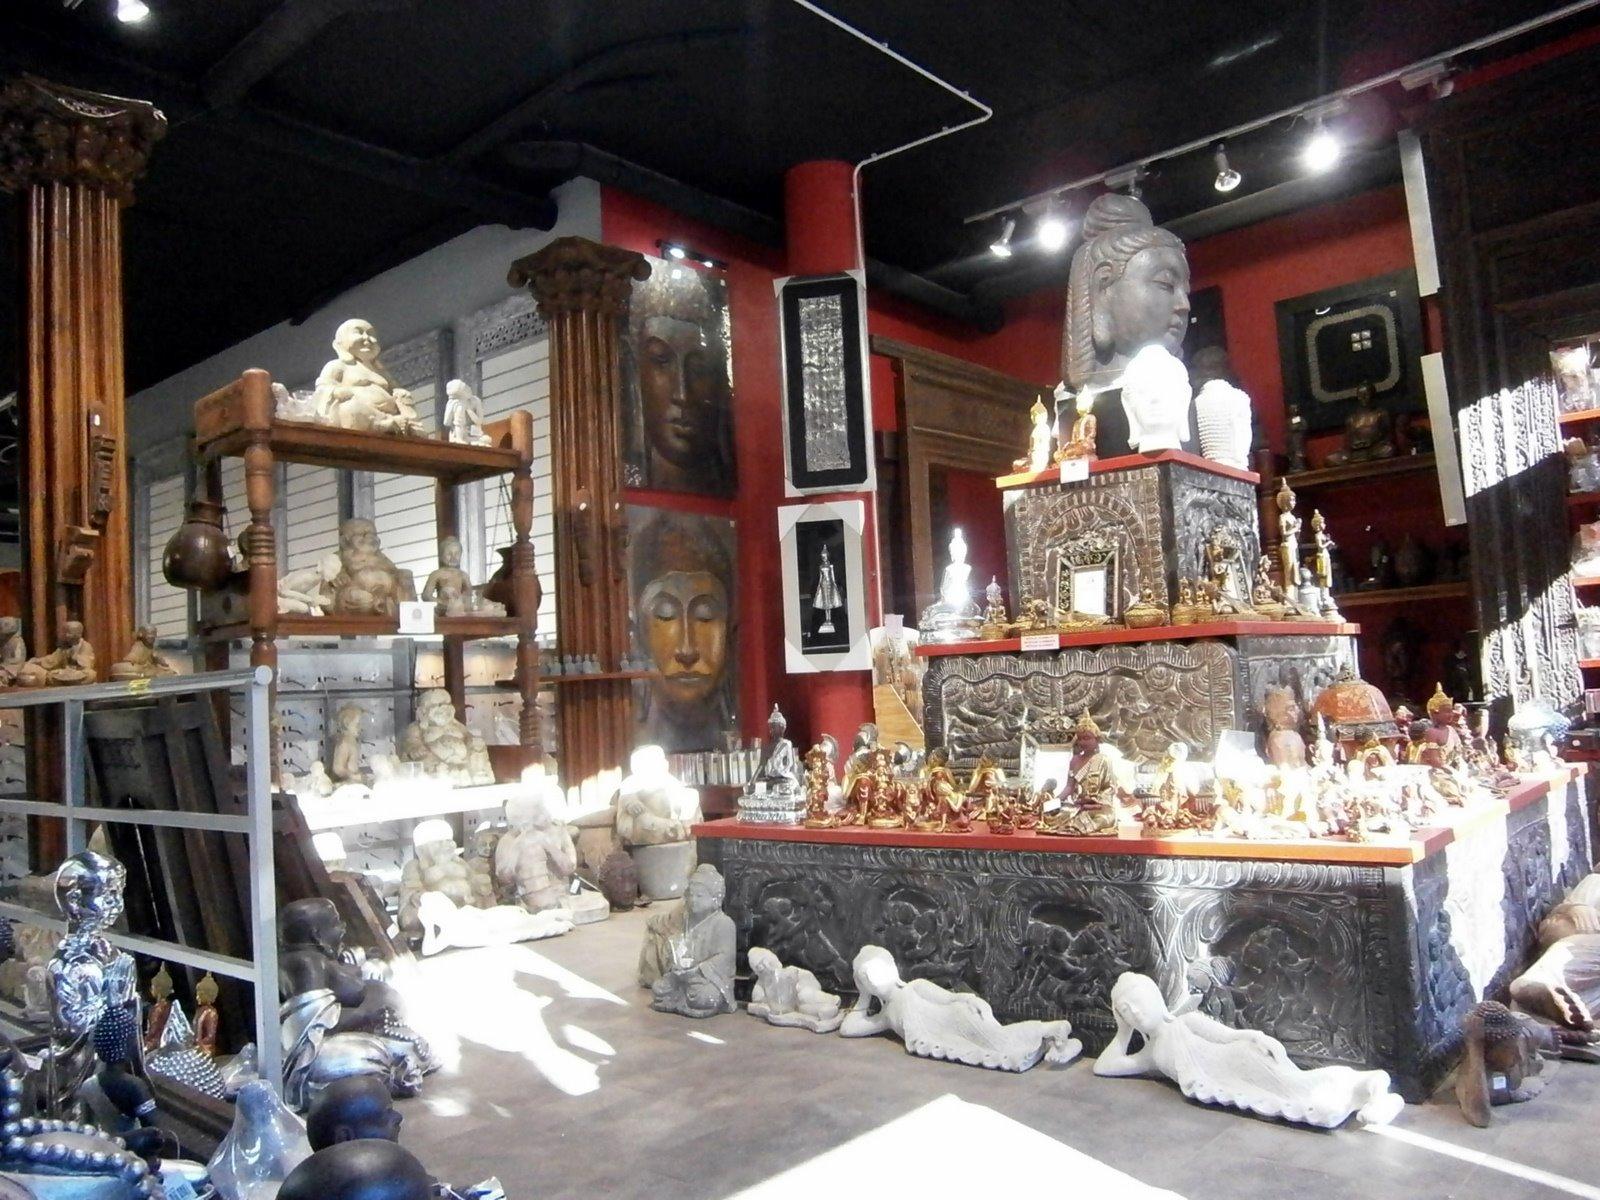 Casa a osseja en la cerdanya francesa donde comprar budas for Casa tiendas de decoracion catalogo